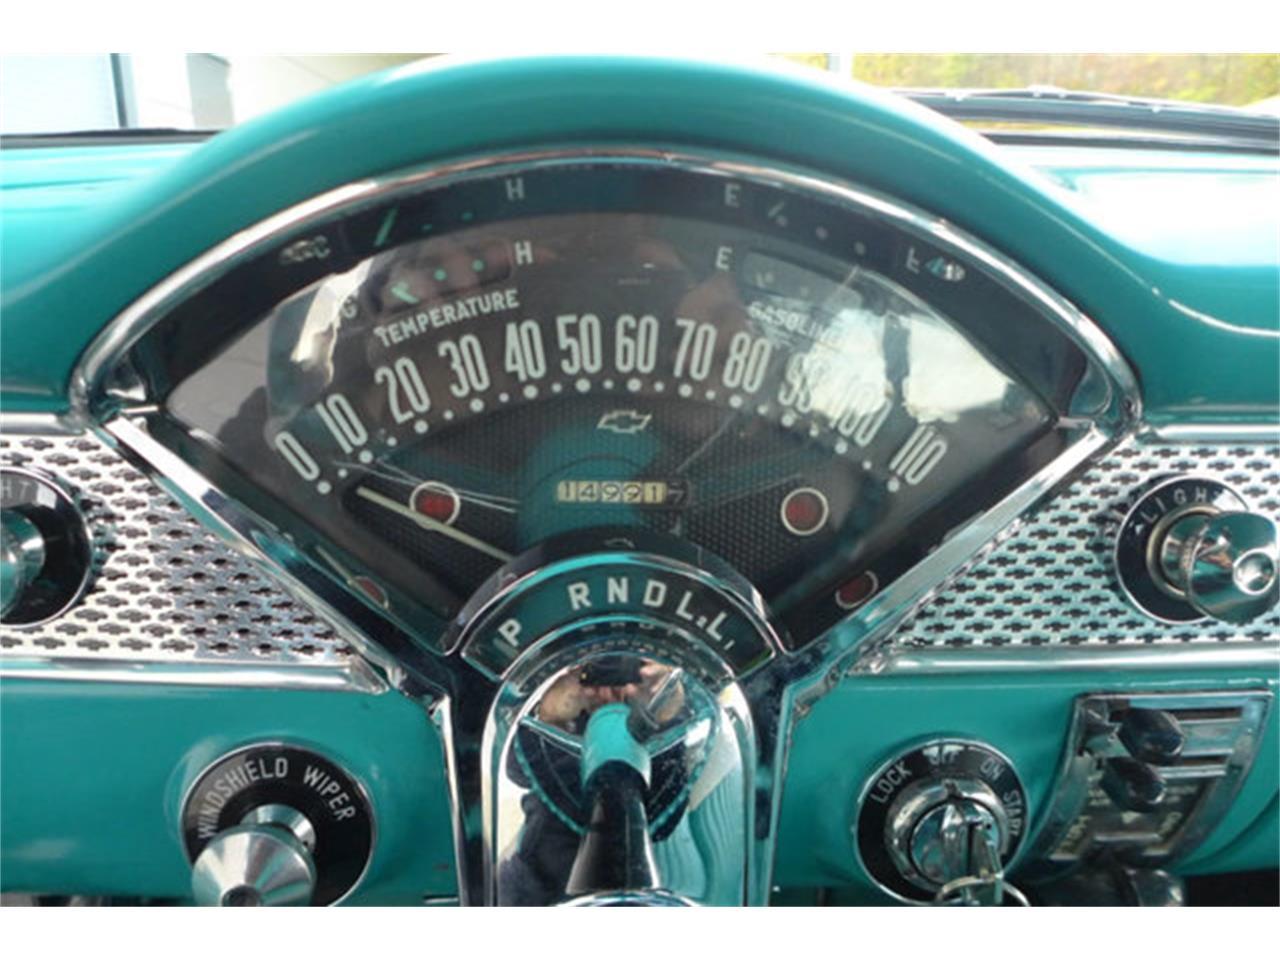 1955 Chevrolet Trim Parts 1020 Full Size Hood Trunk Emblem